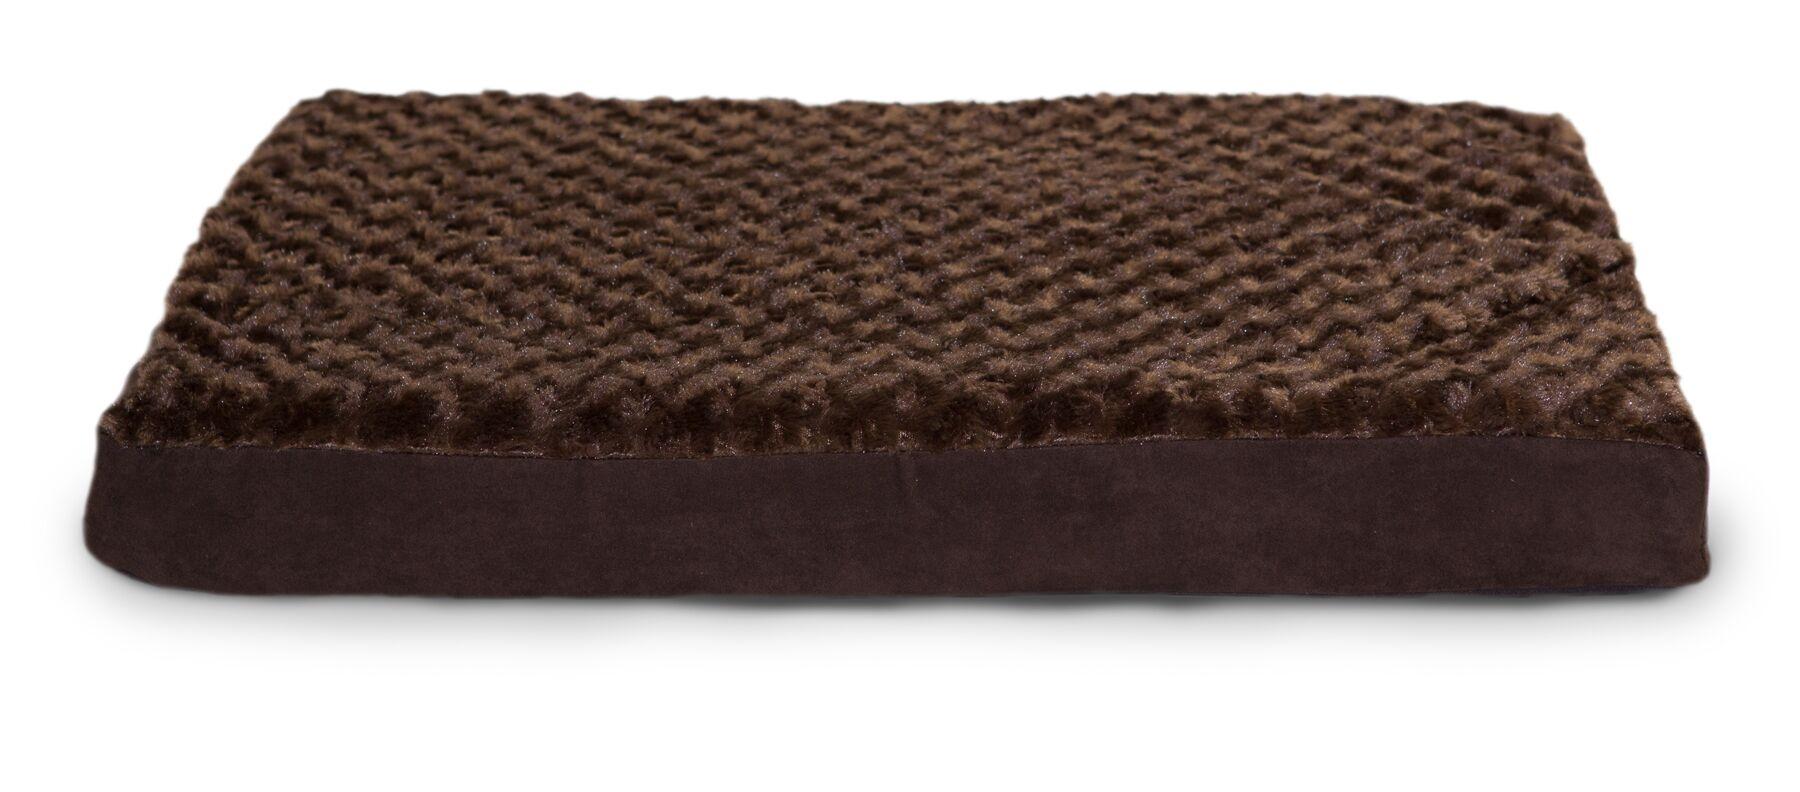 Boris Ultra Plush Cooling Gel Foam Pet Bed Color: Chocolate, Size: Extra Large